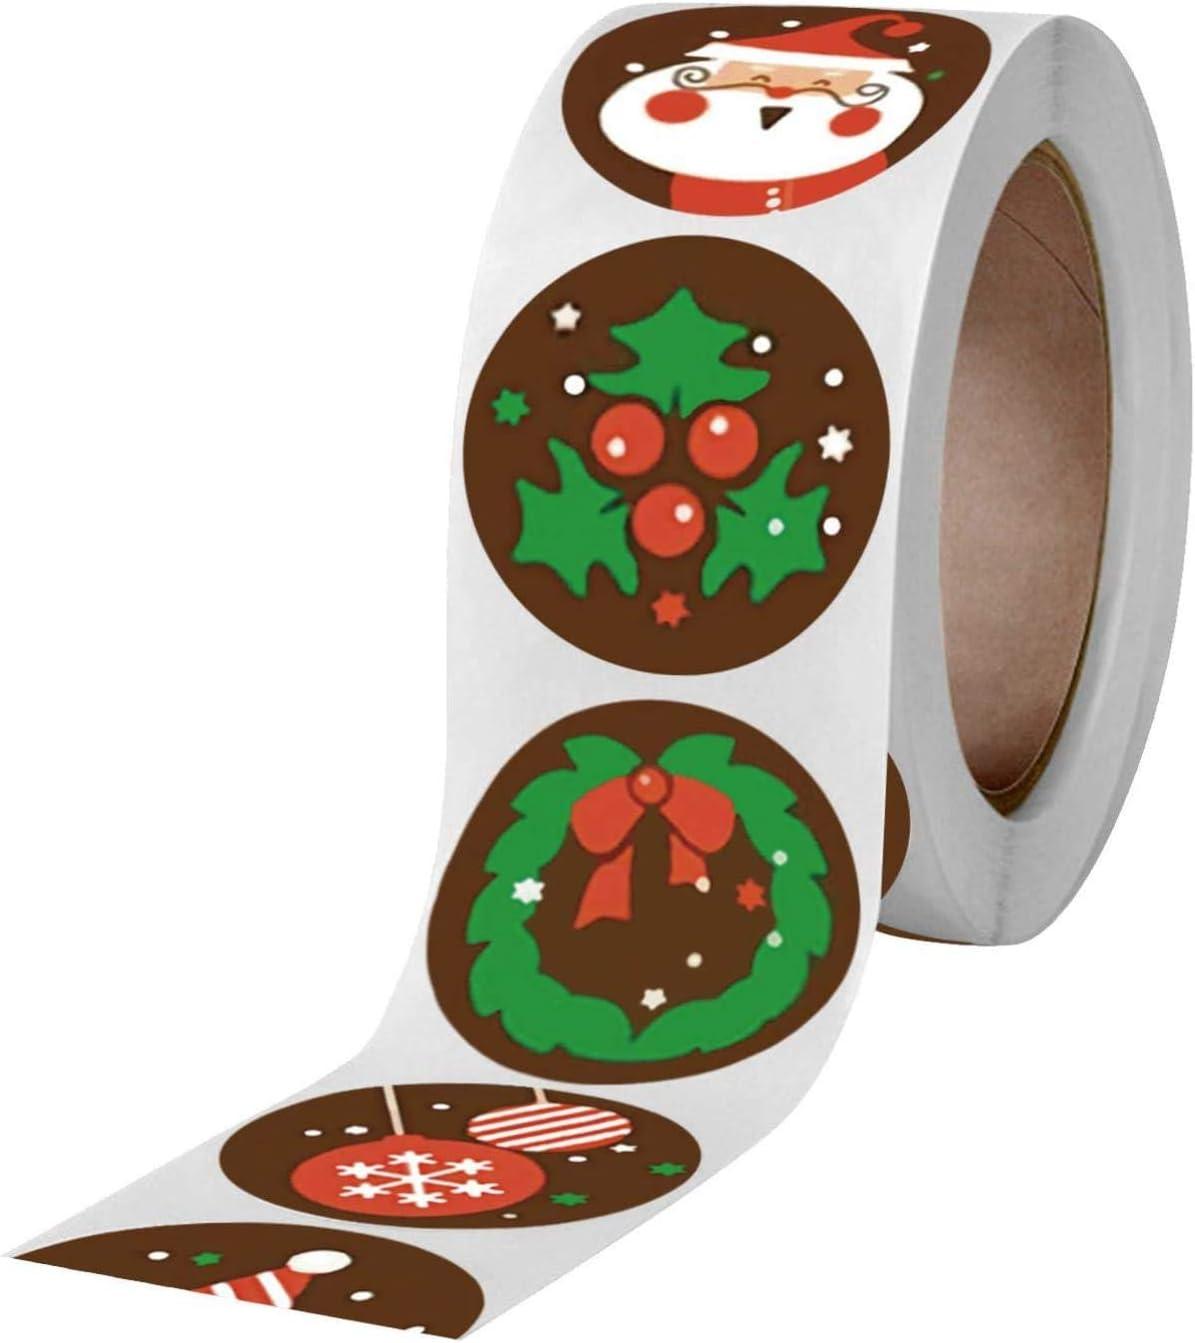 WasaFire Pegatina Navidad Etiqueta Adhesiva Redonda Papel Decoraci/ón Cajas Regalos Bombones Caramelo Regalo Fiesta Sello Bolsas para decoraci/ón de Navidad